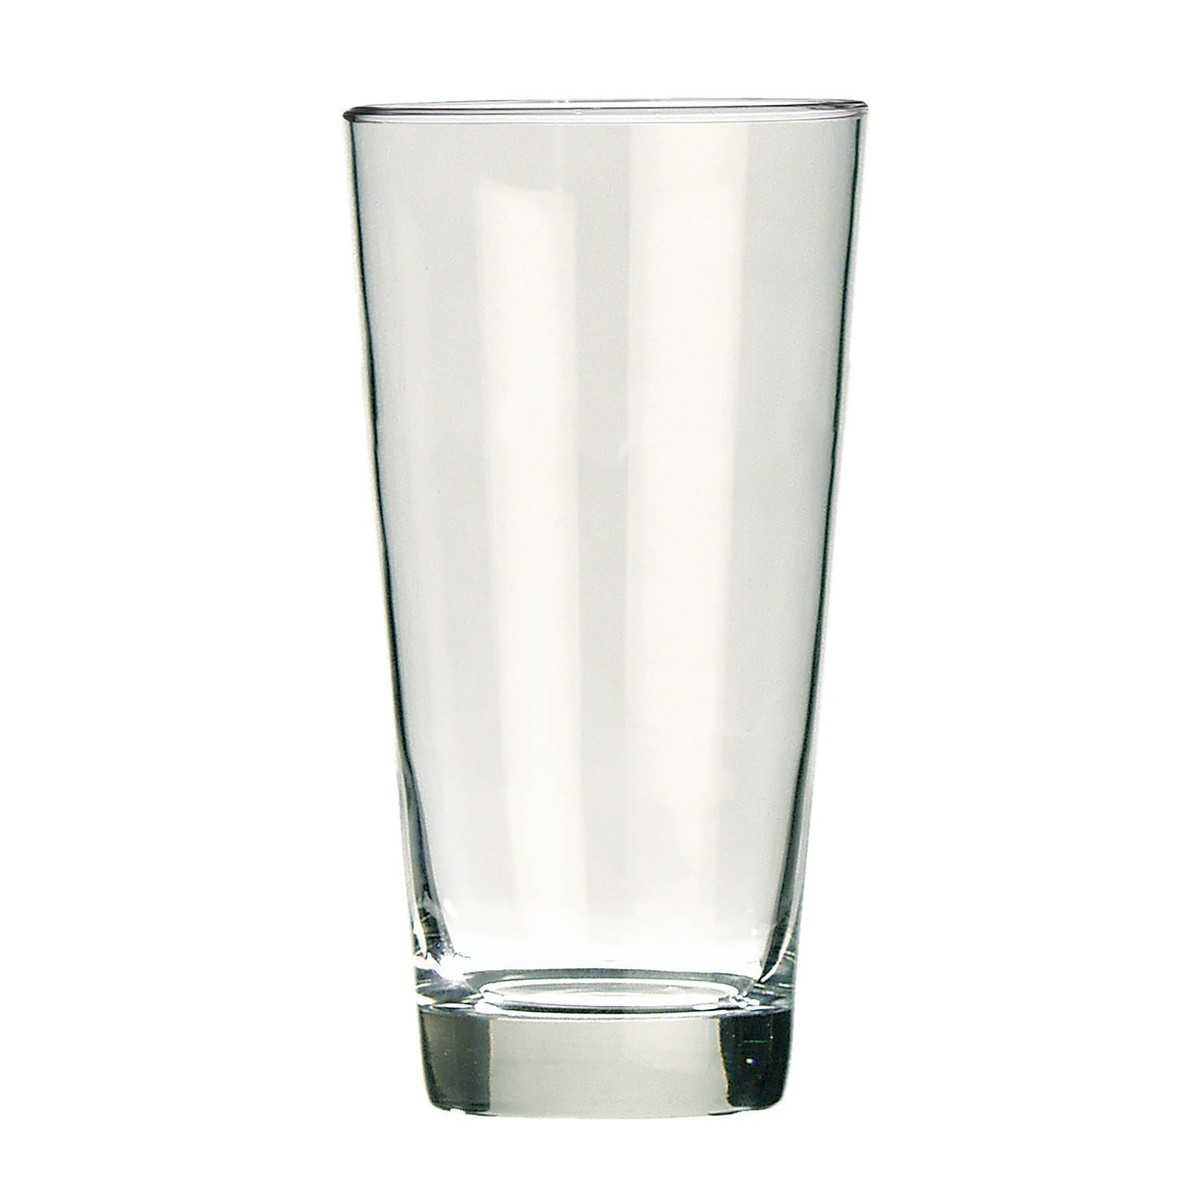 Cocktail-/Boston-Shaker Ersatzglas